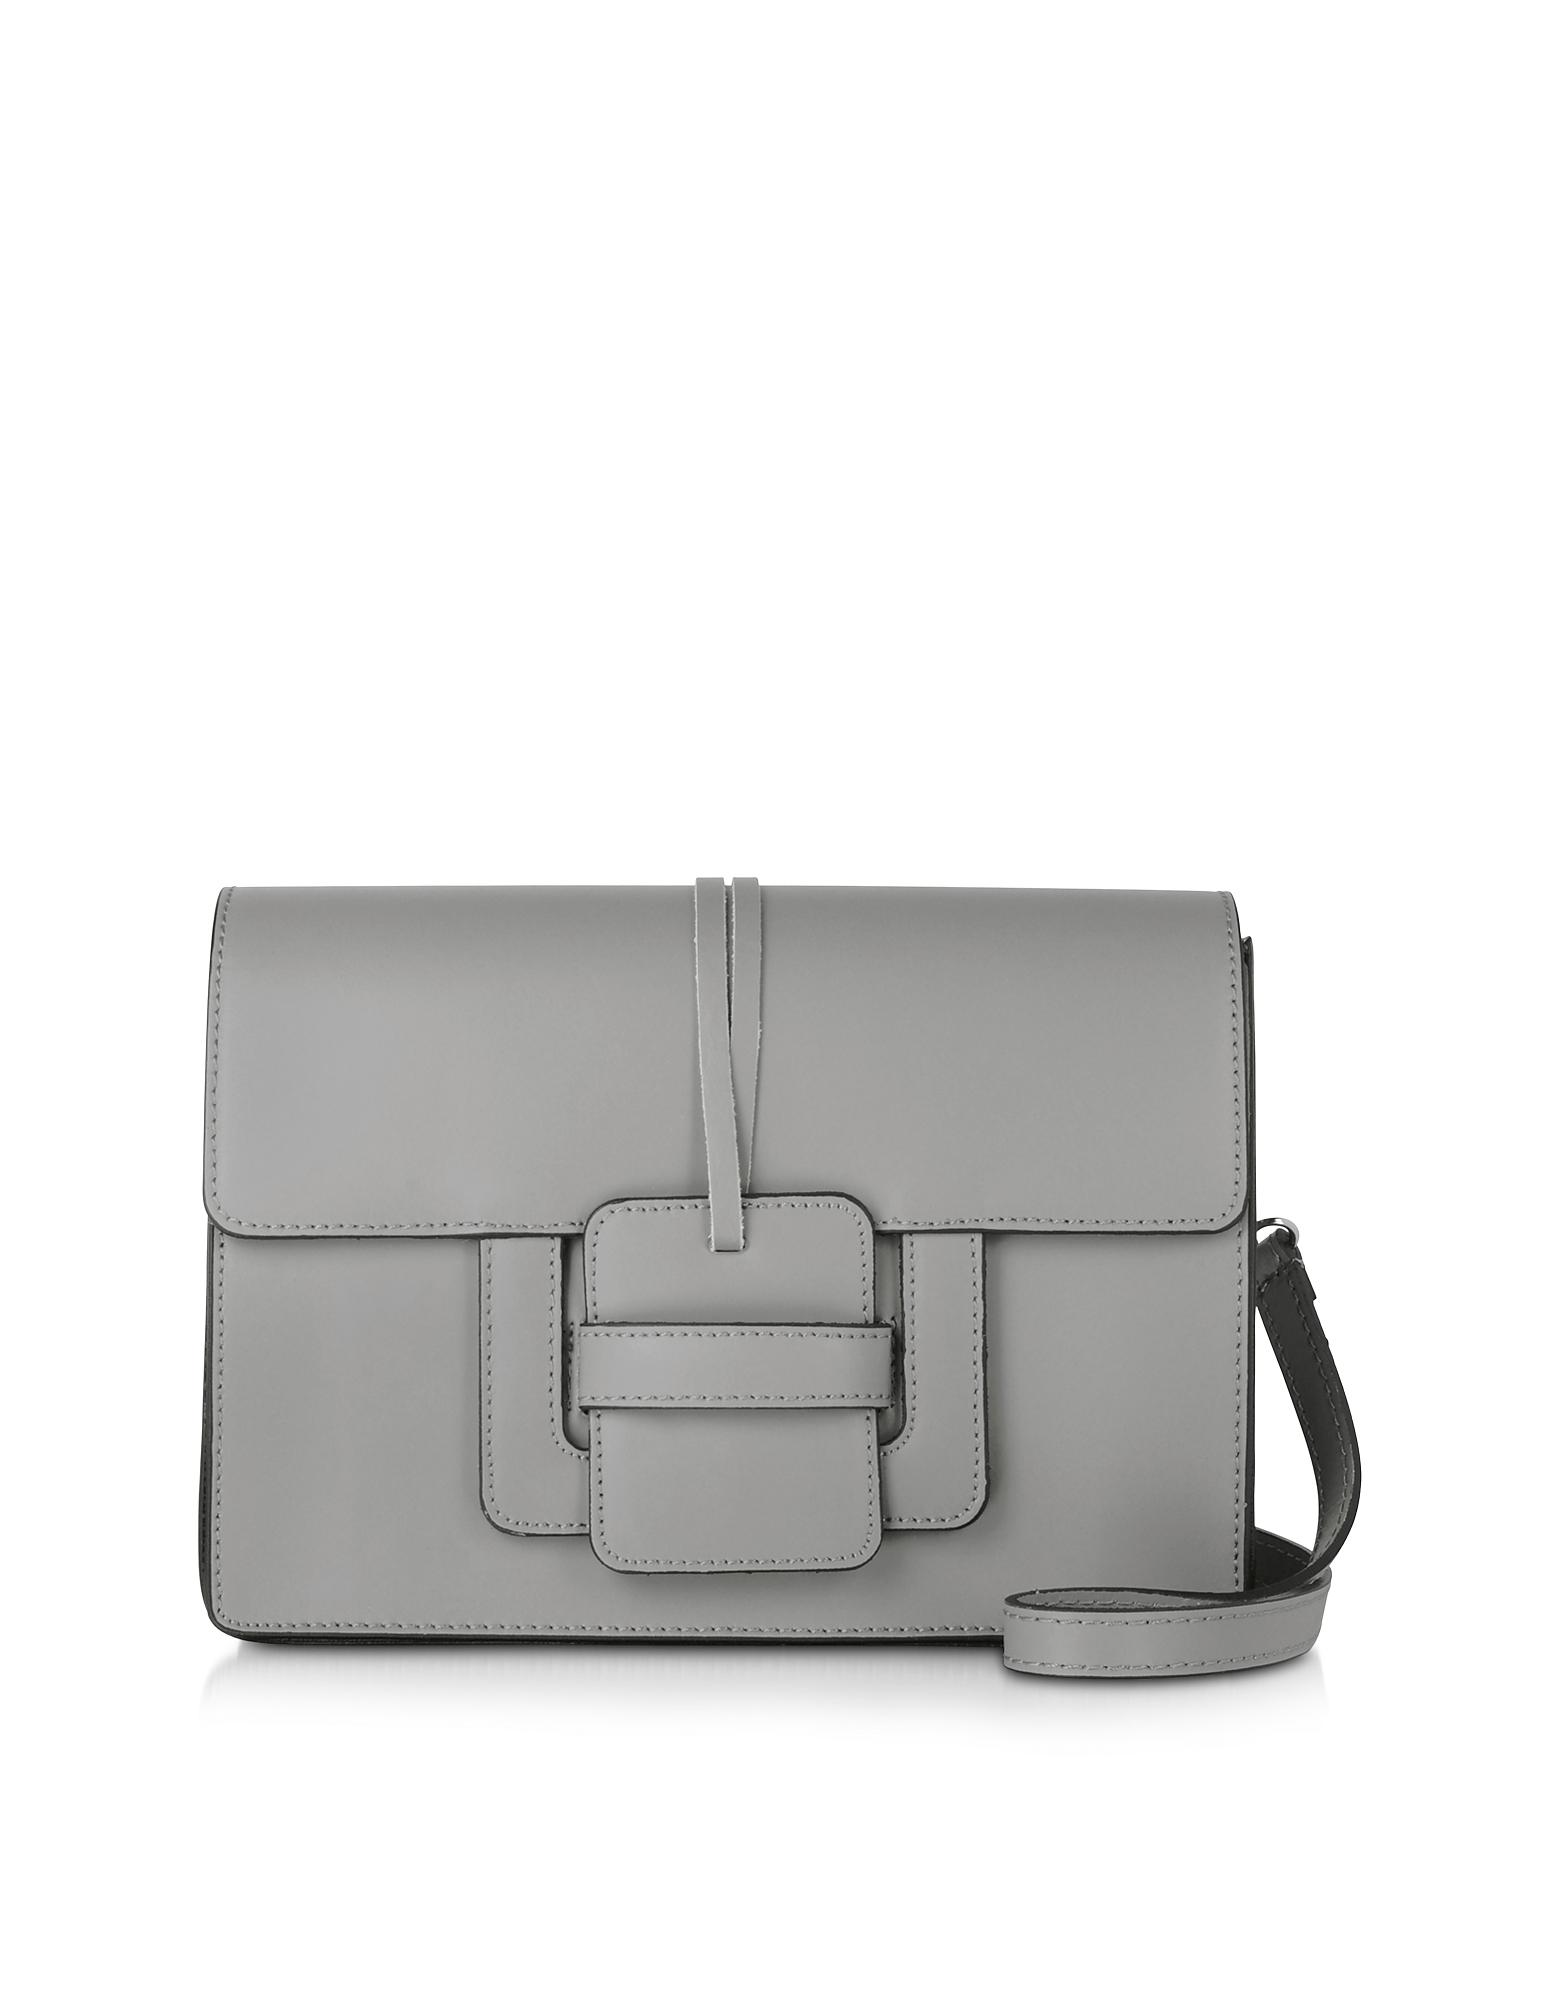 Le Parmentier Handbags, Gray Leather Shoulder Bag